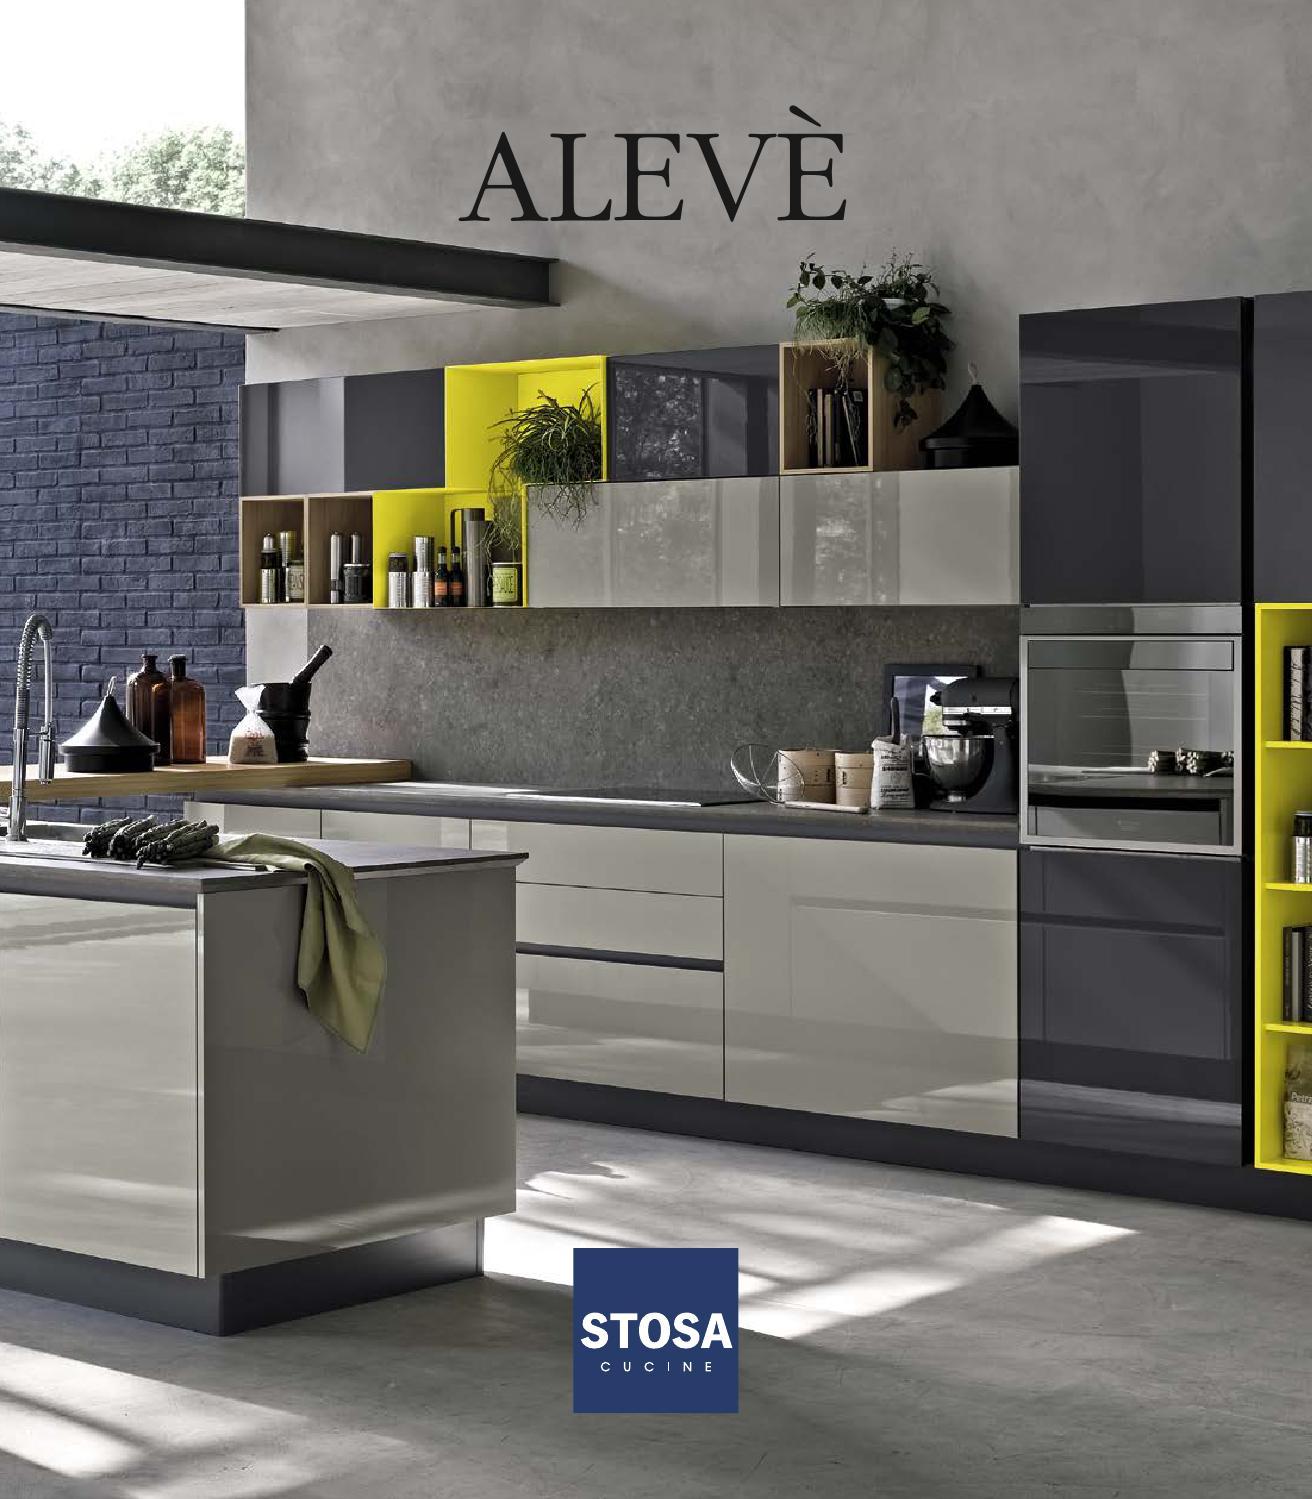 Catalogo cucine stosa moderne alevè by STOSA Cucine - issuu